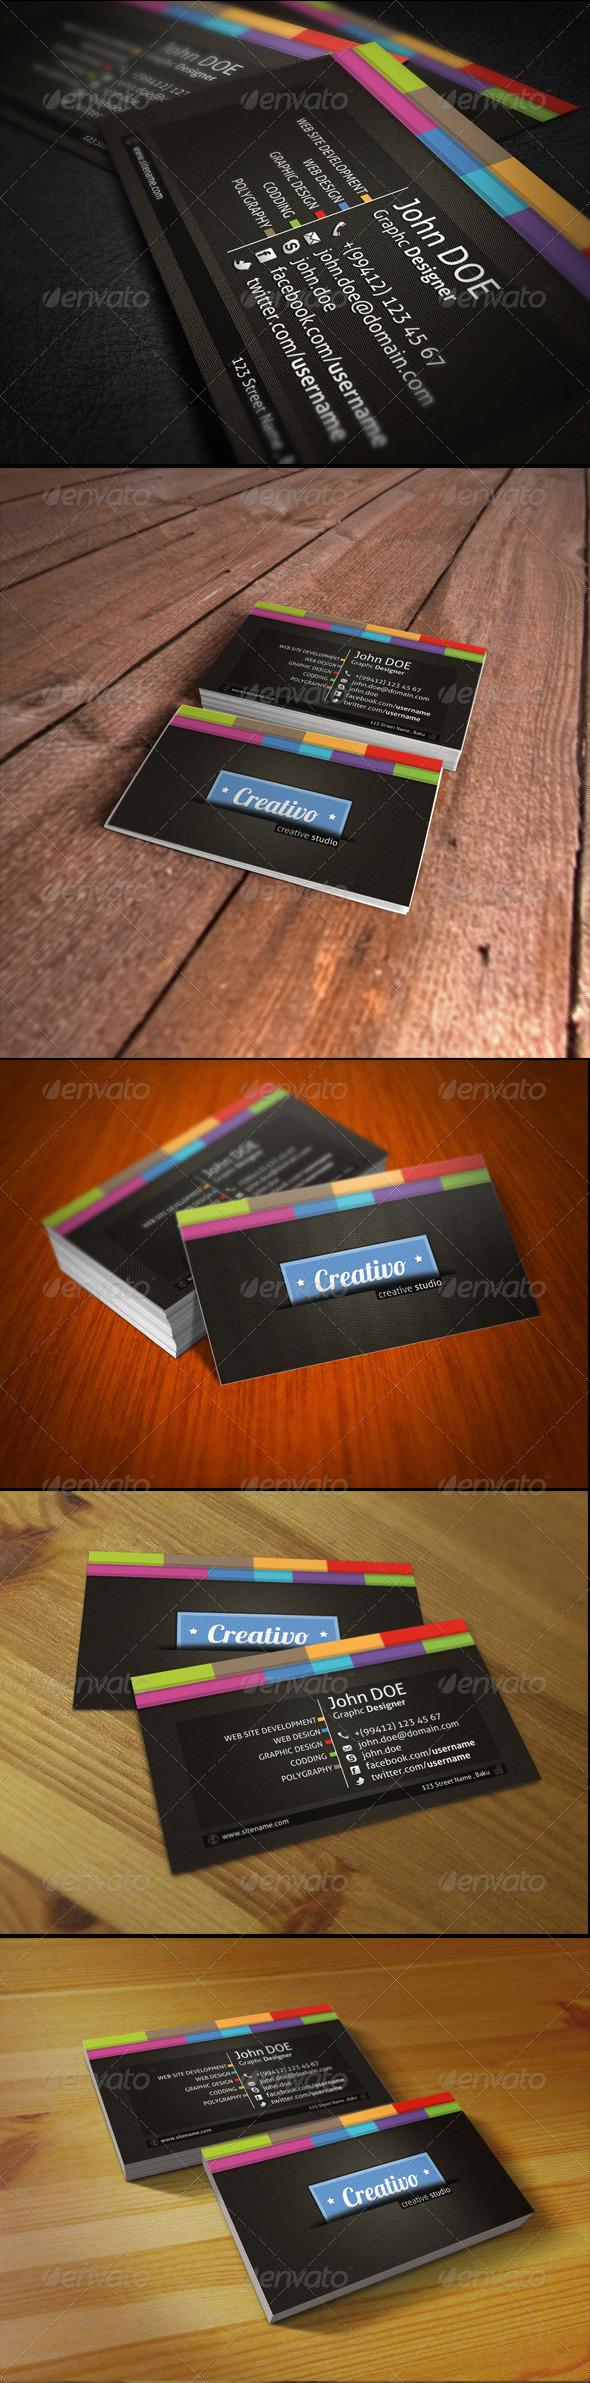 GraphicRiver Creativo Business Card 1570959